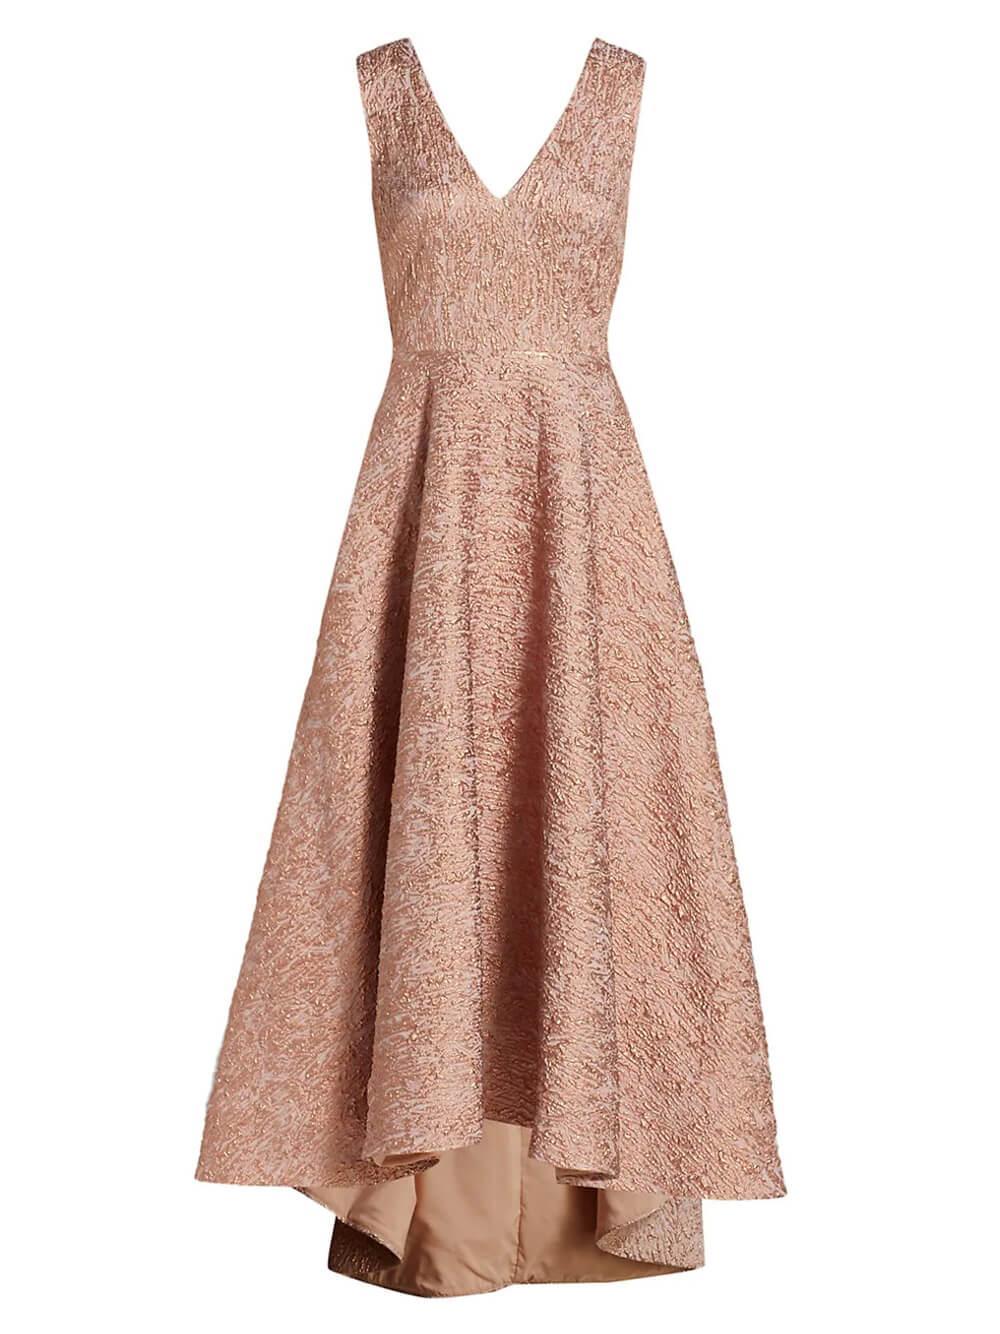 Nova Dress Item # 8814682